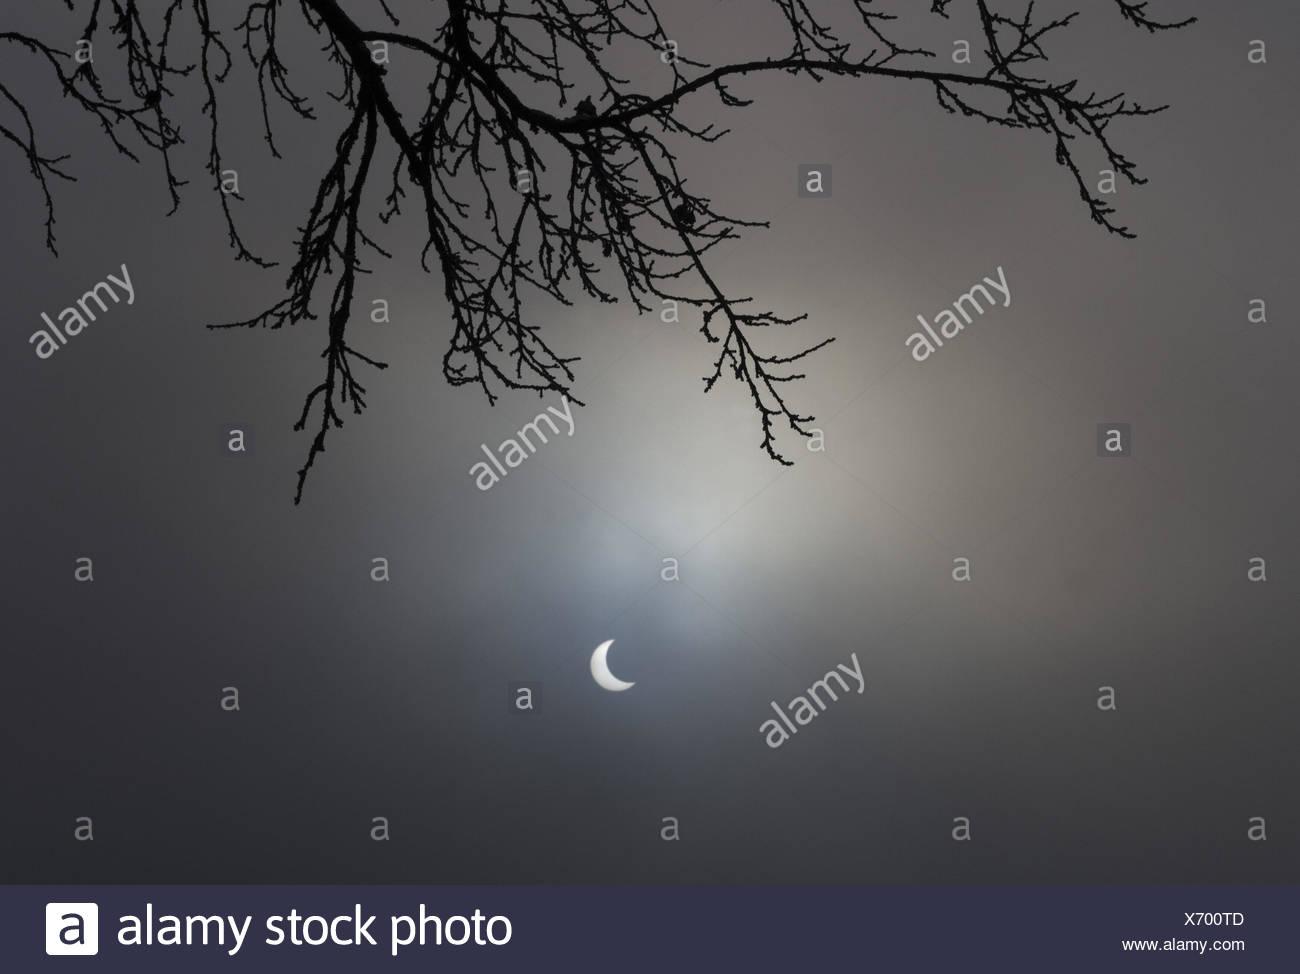 Austria, salt chamber property, lunar lake, solar darkness, 04.01.2011, - Stock Image